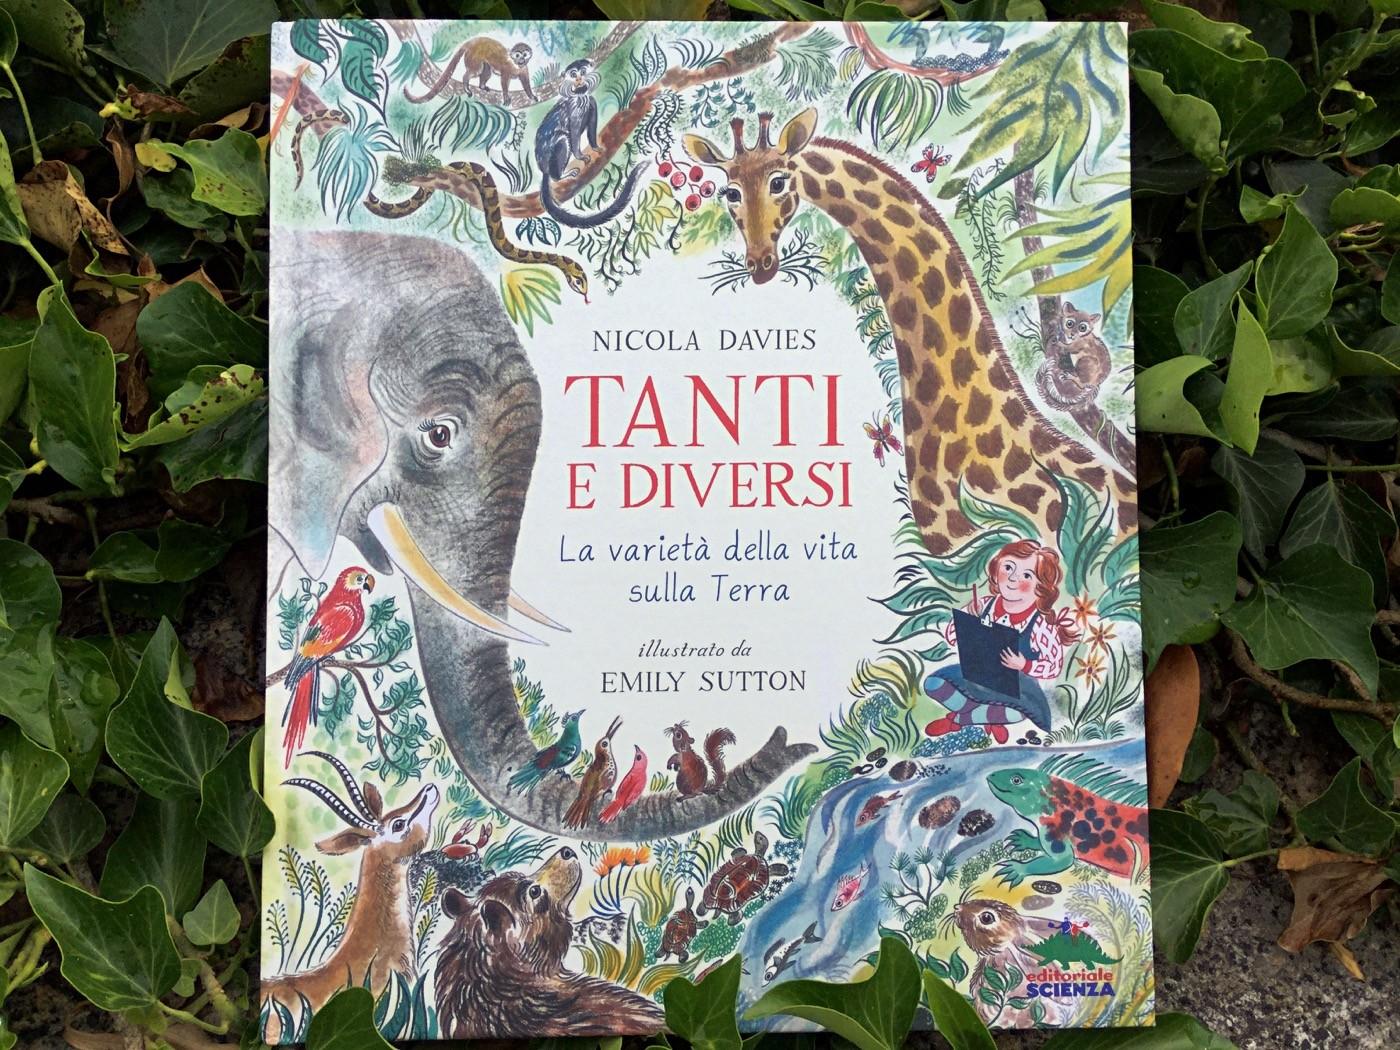 Tanti-diversi-nicola-davies-emily-sutton-editoriale-scienza-galline-volanti